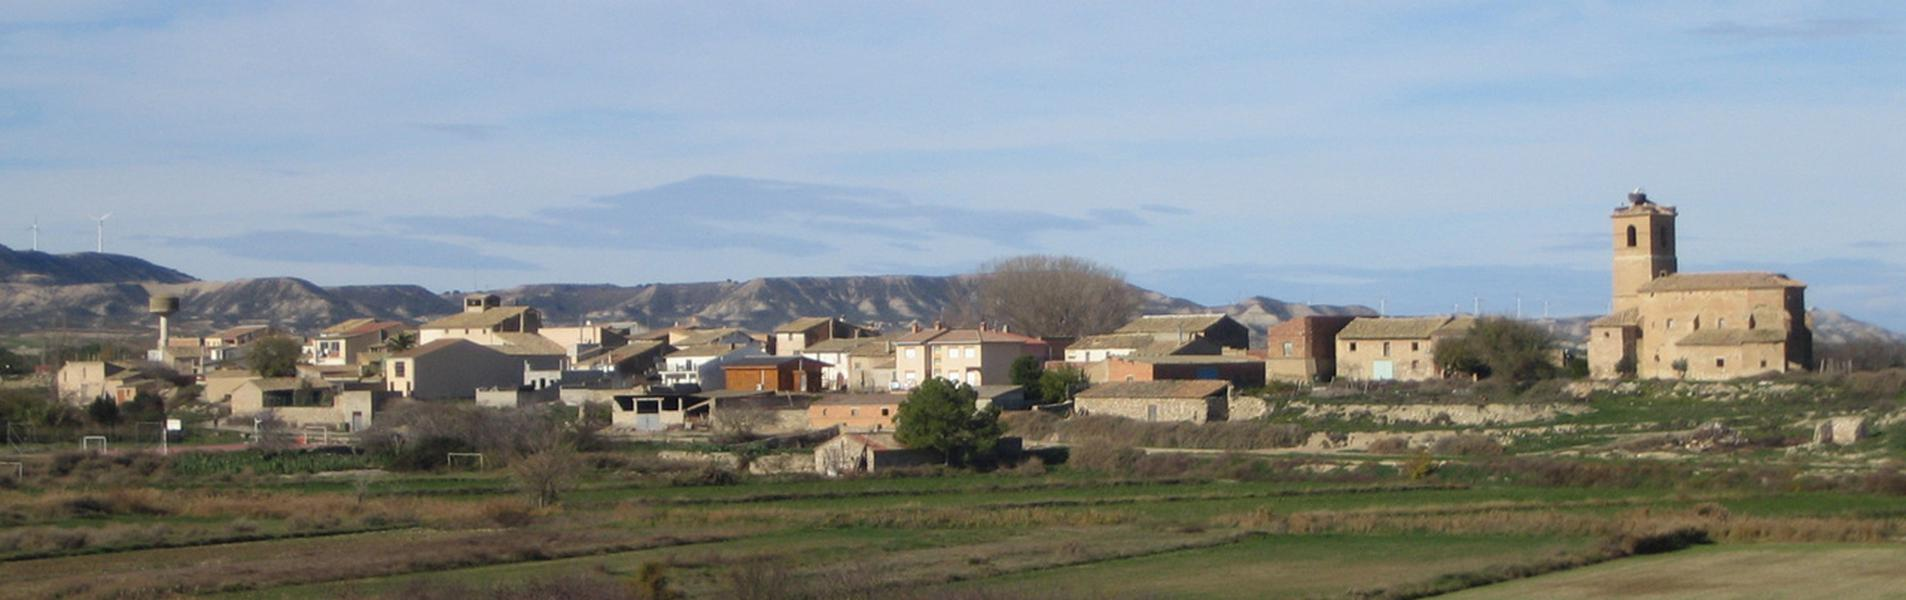 Senés de Alcubierre